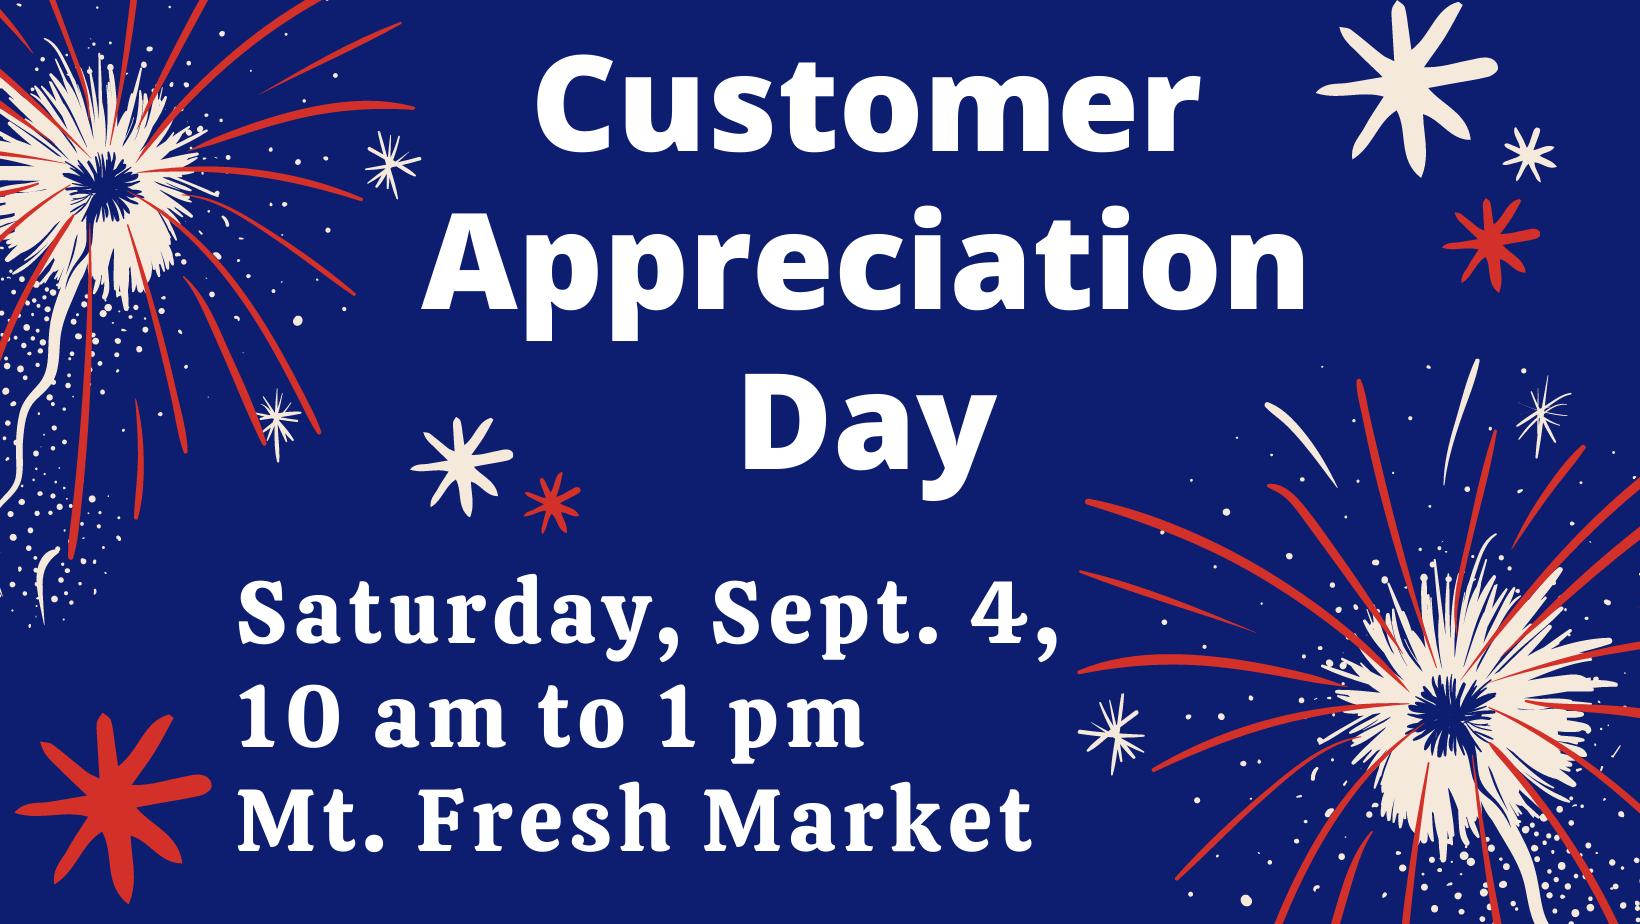 Mountain Fresh Farmers Market: Customer Appreciation Day